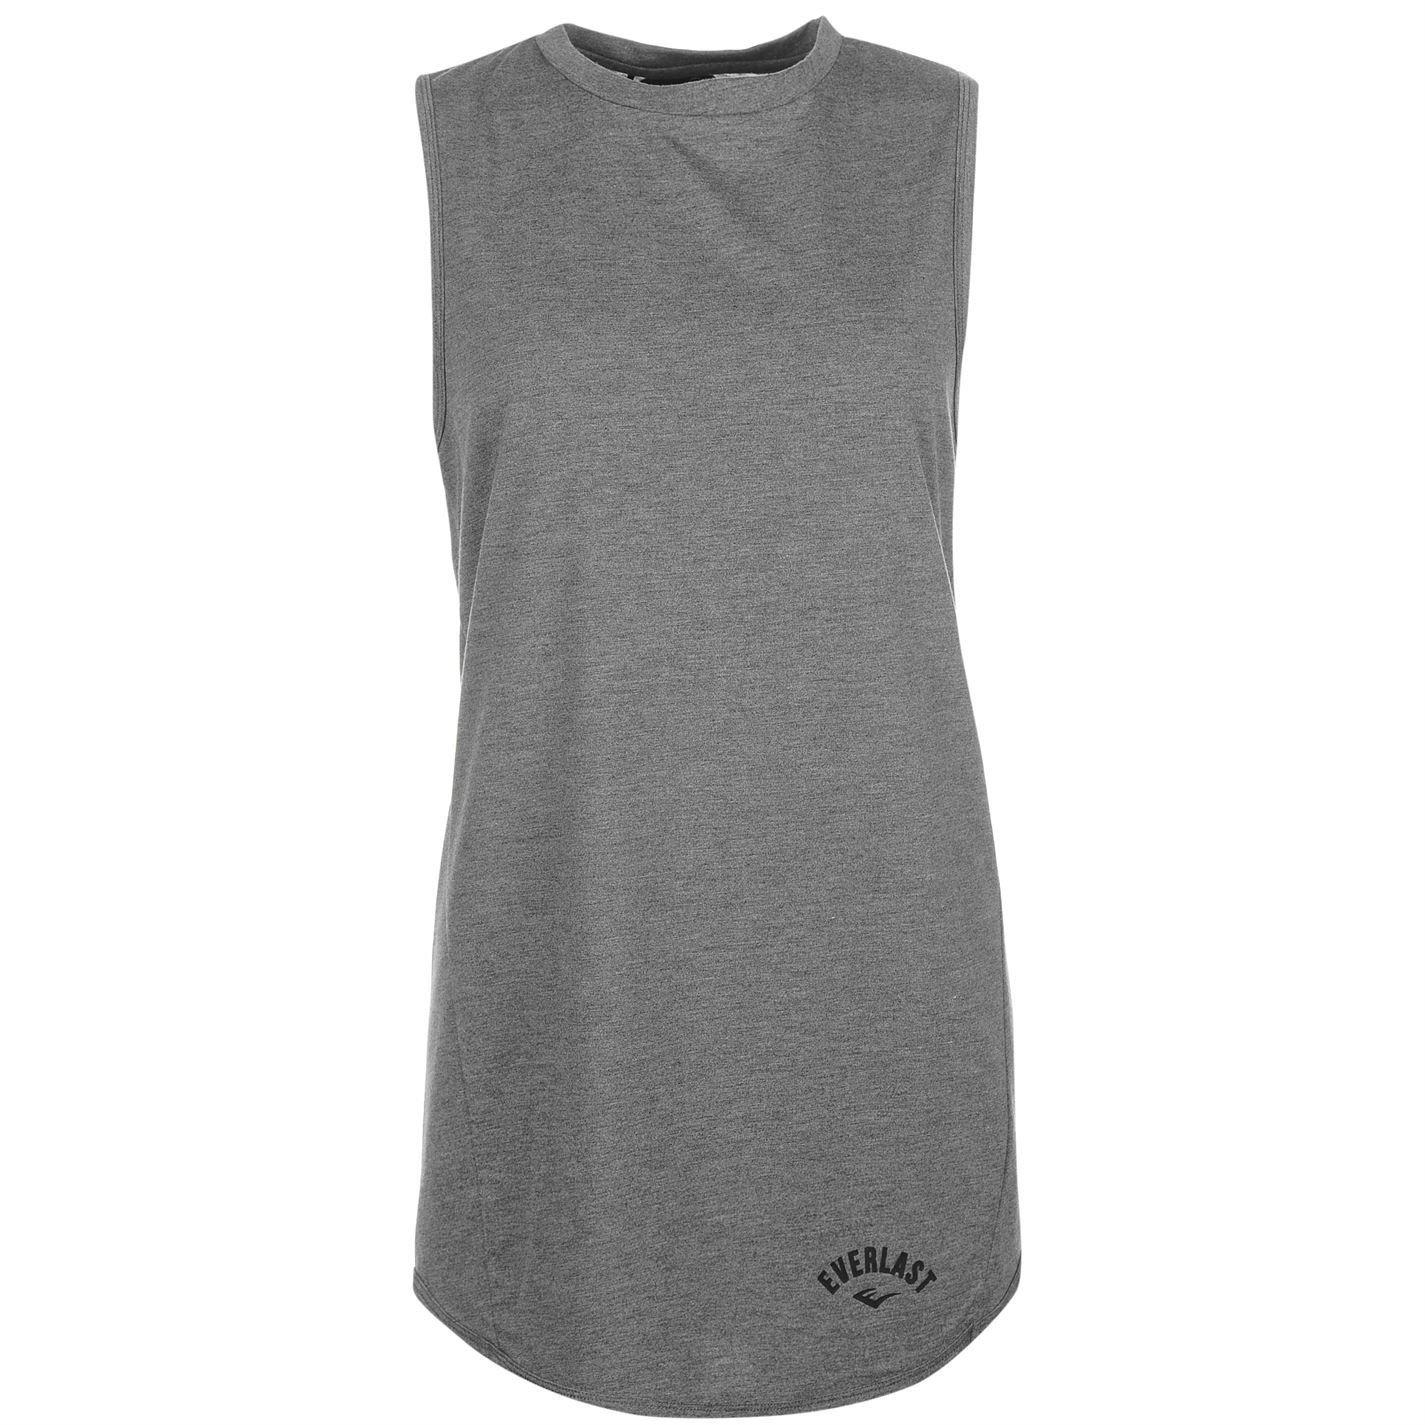 Everlast Womens Long Vest Tank Top Sleeveless Crew Neck Lightweight:  Amazon.co.uk: Clothing